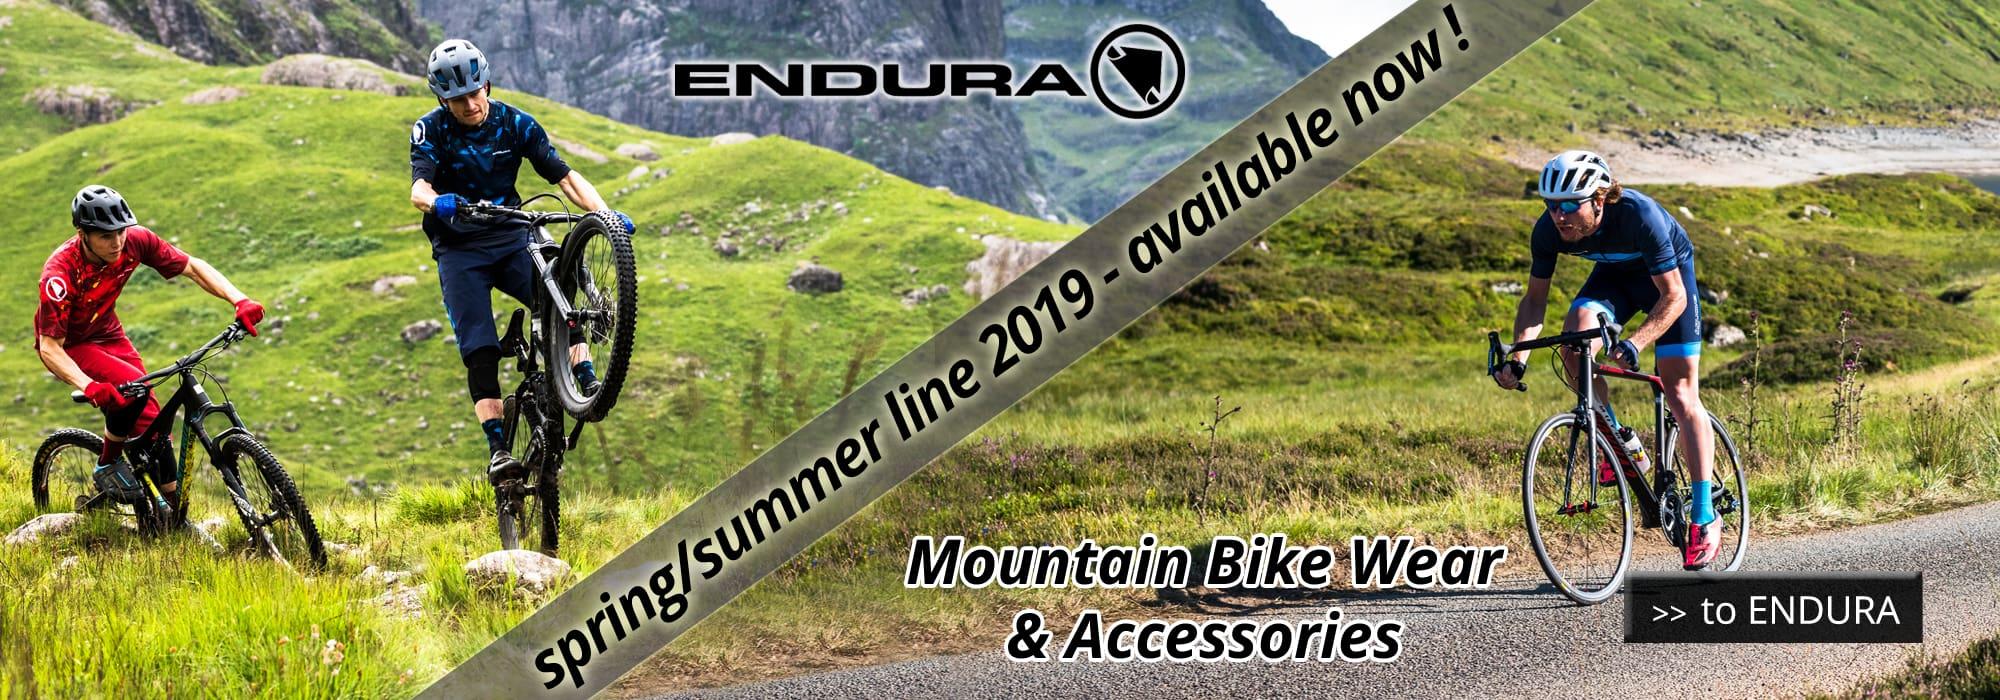 Endura 2019 Mountain Bike Wear & Accessories